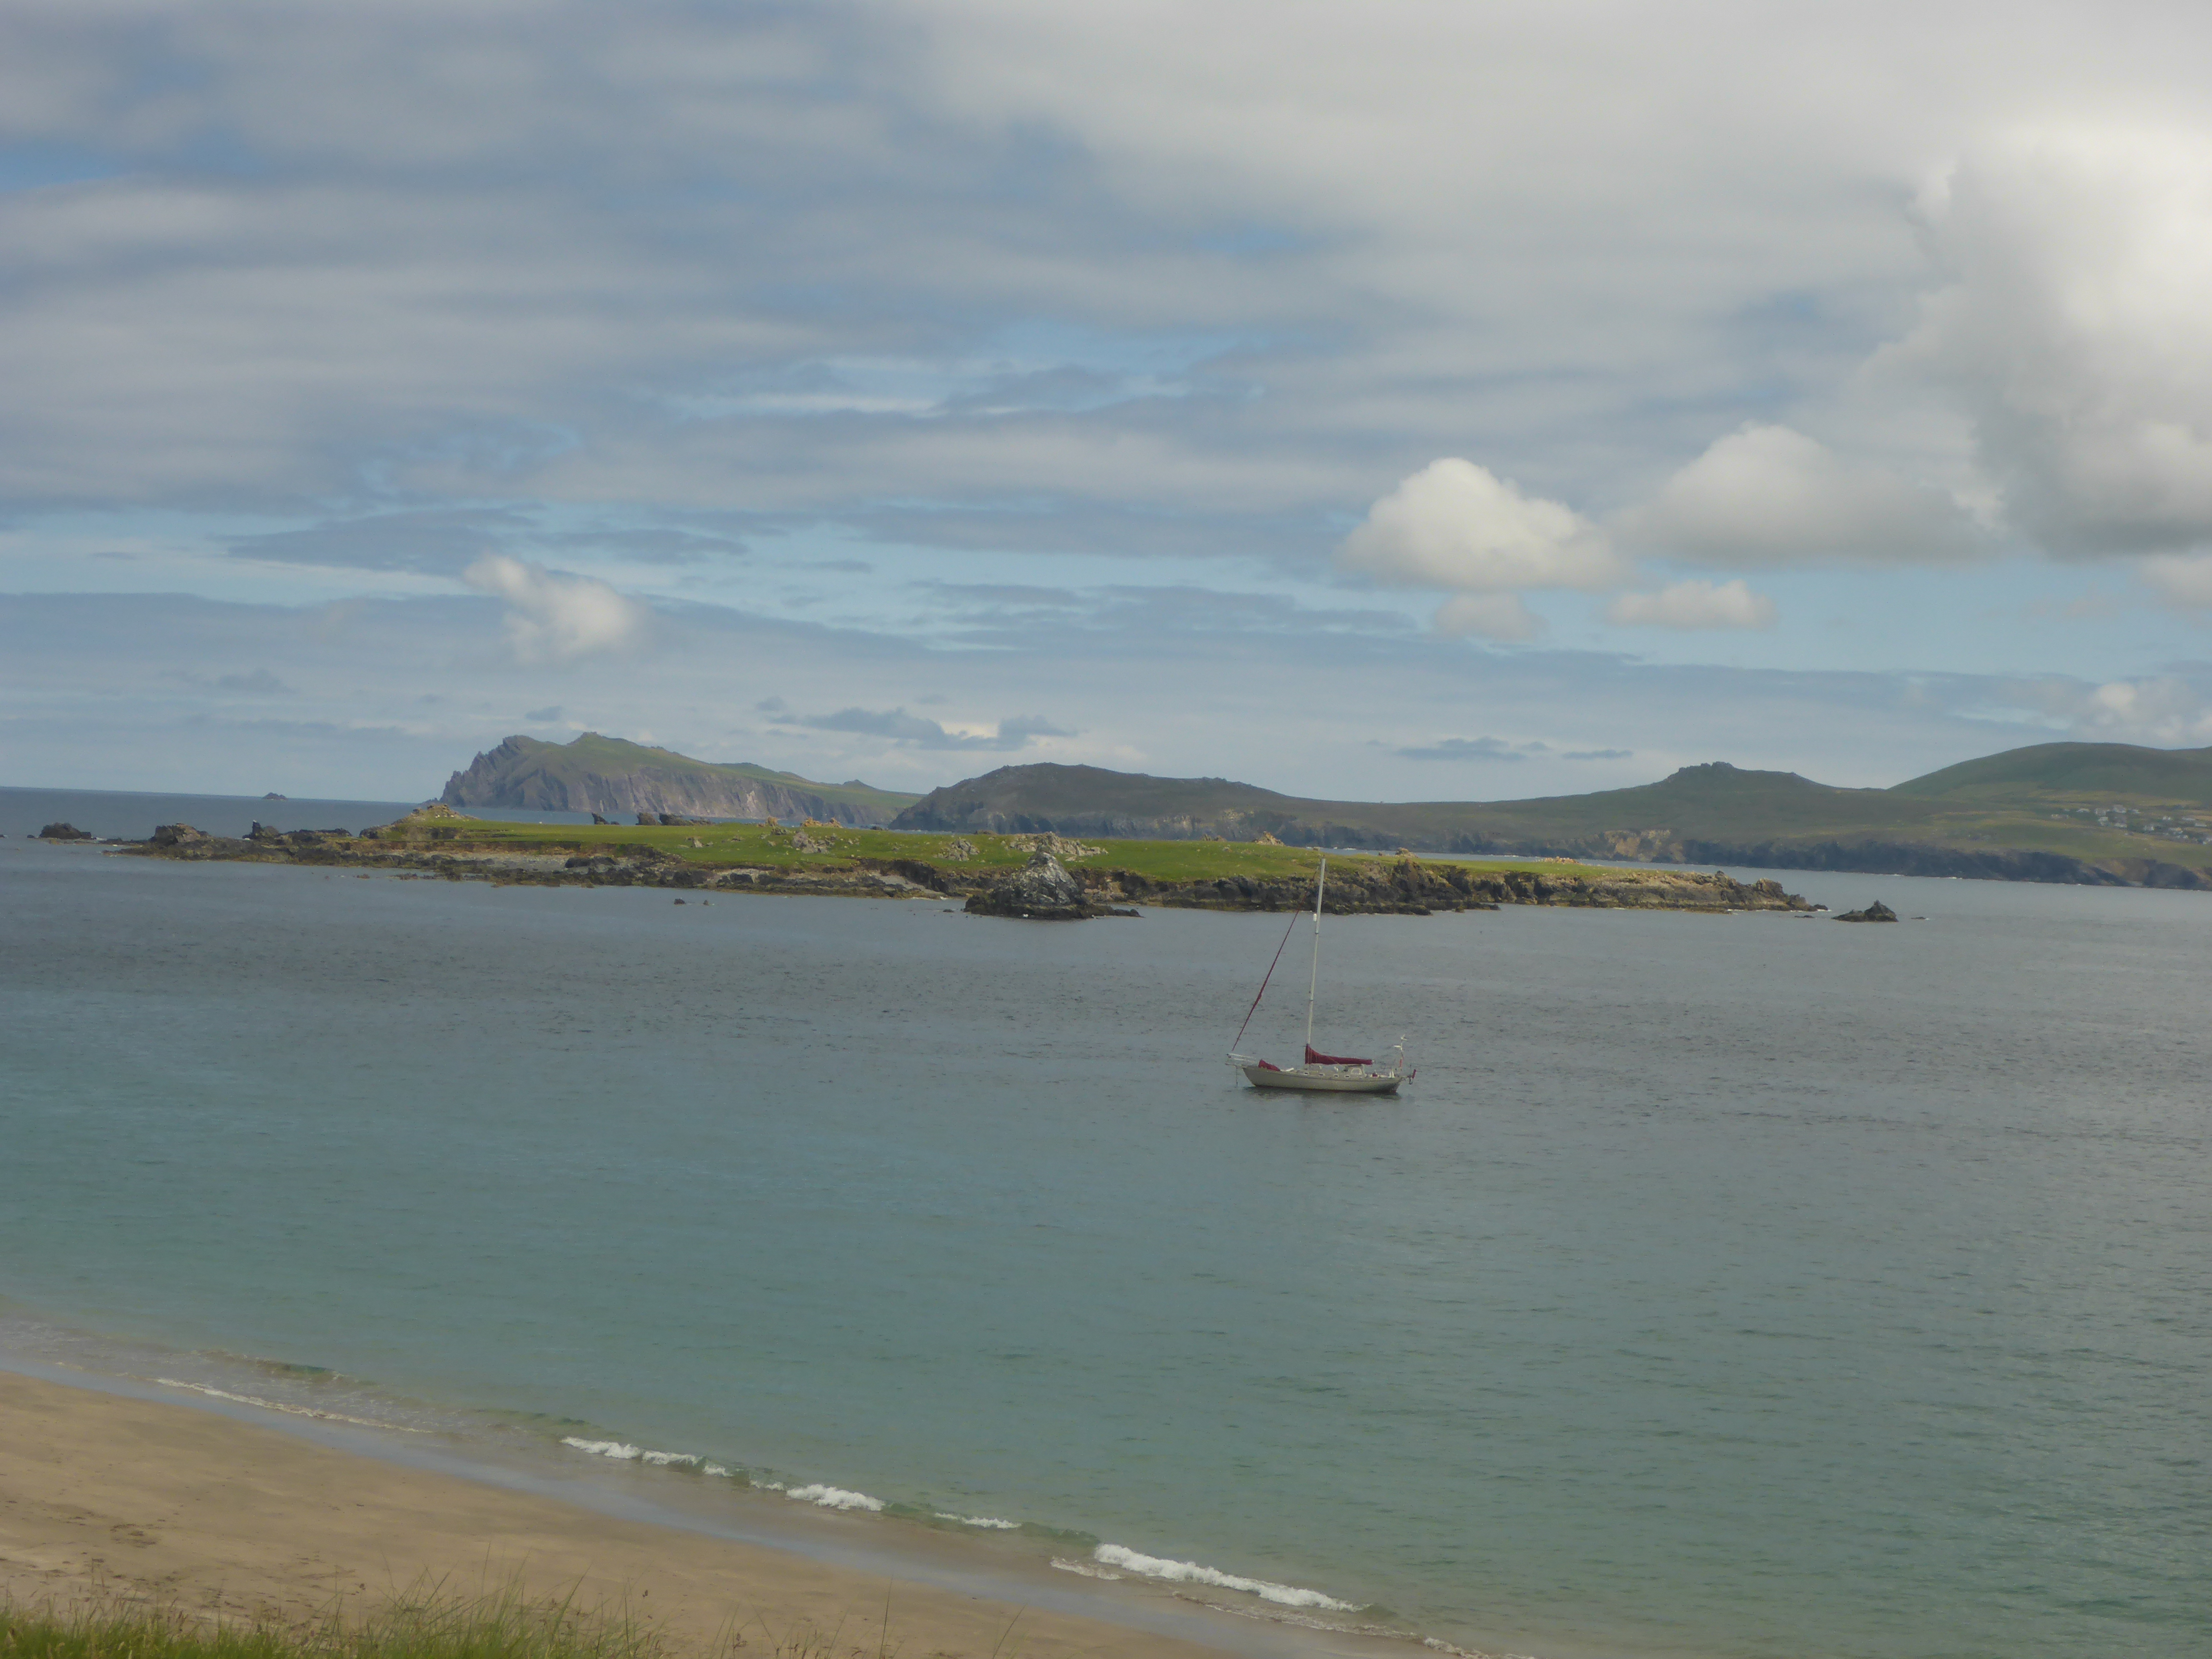 Looking towards Beginish Island from Great Blasket